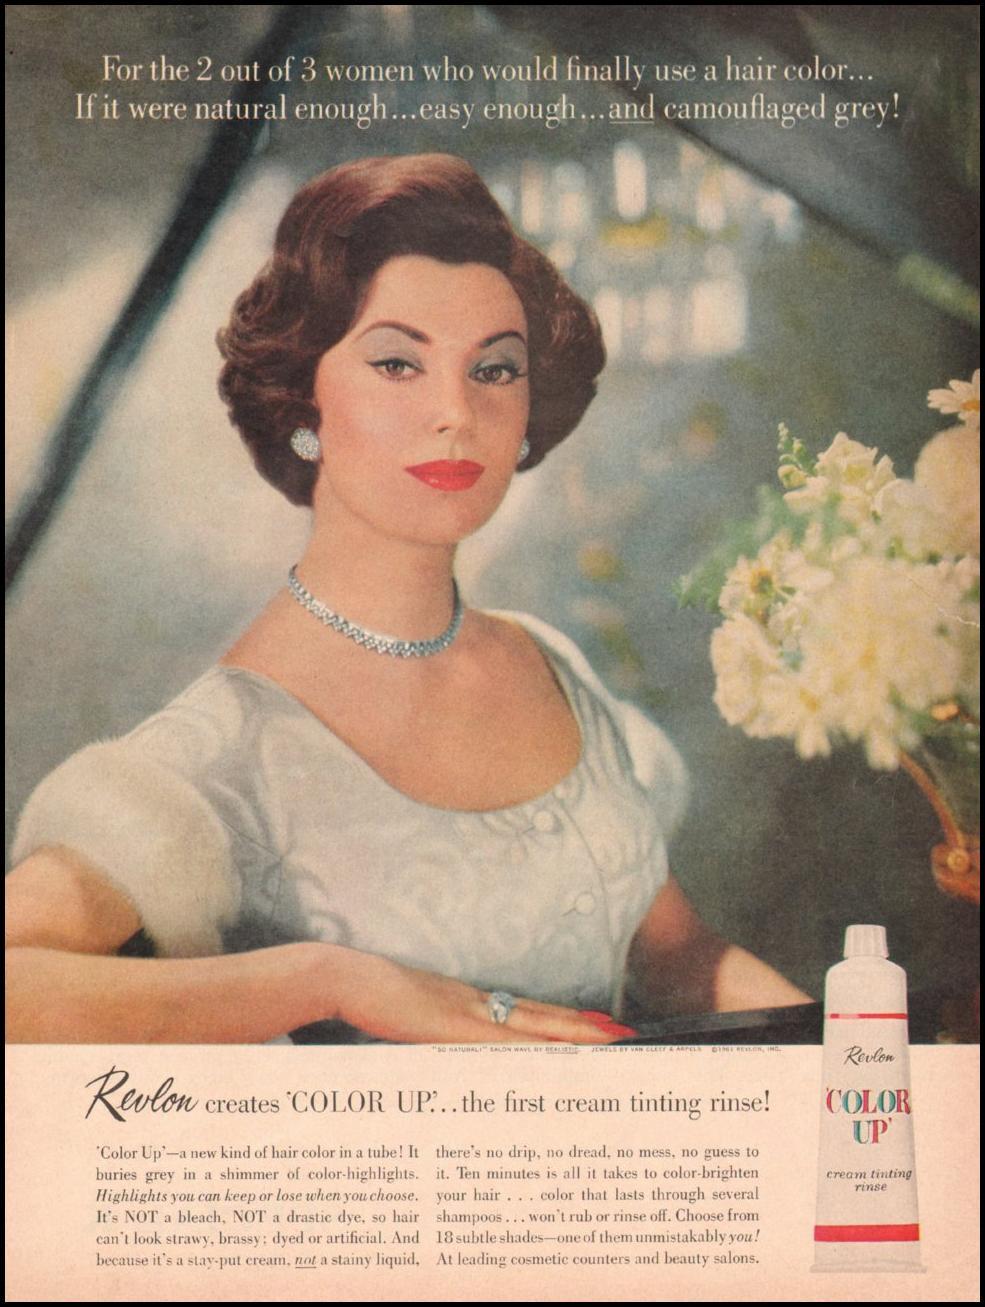 REVLON COLOR-UP CREAM TINTING RINSE LIFE 05/05/1961